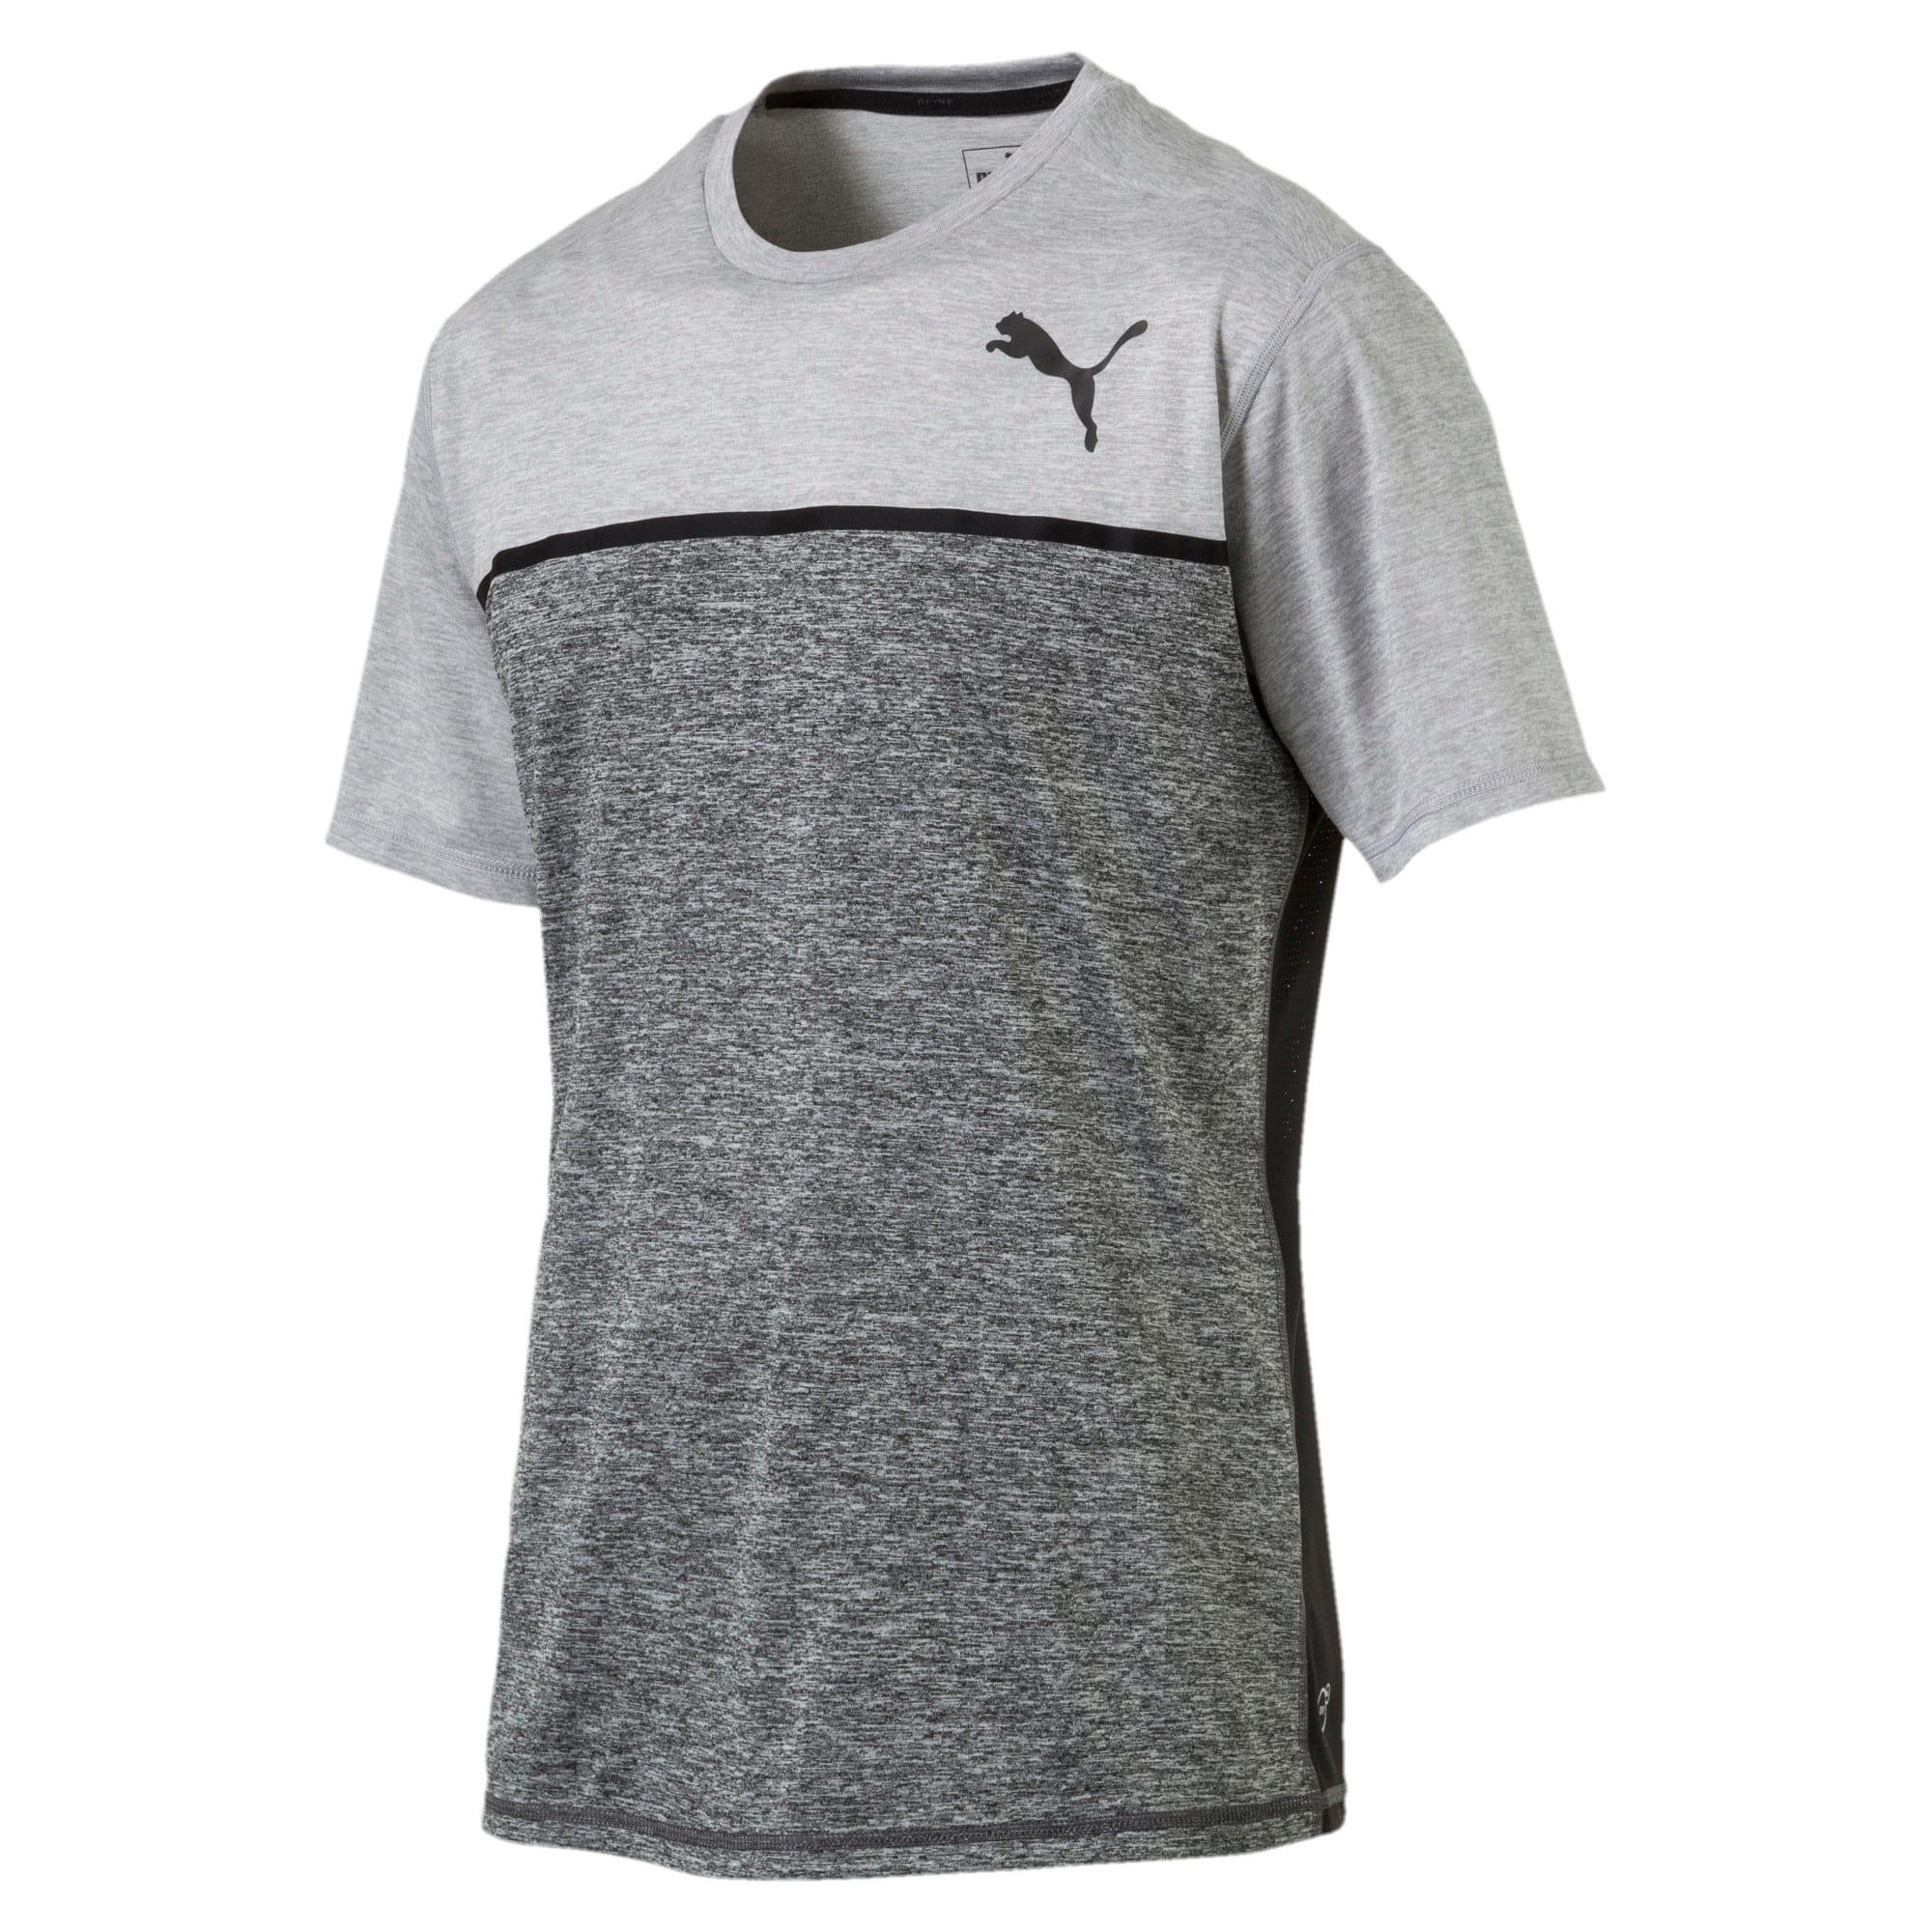 Thumbnail 3 of Active Training Men's Bonded Tech T-Shirt, Light GrayHthr-Dark GrayHthr, medium-IND